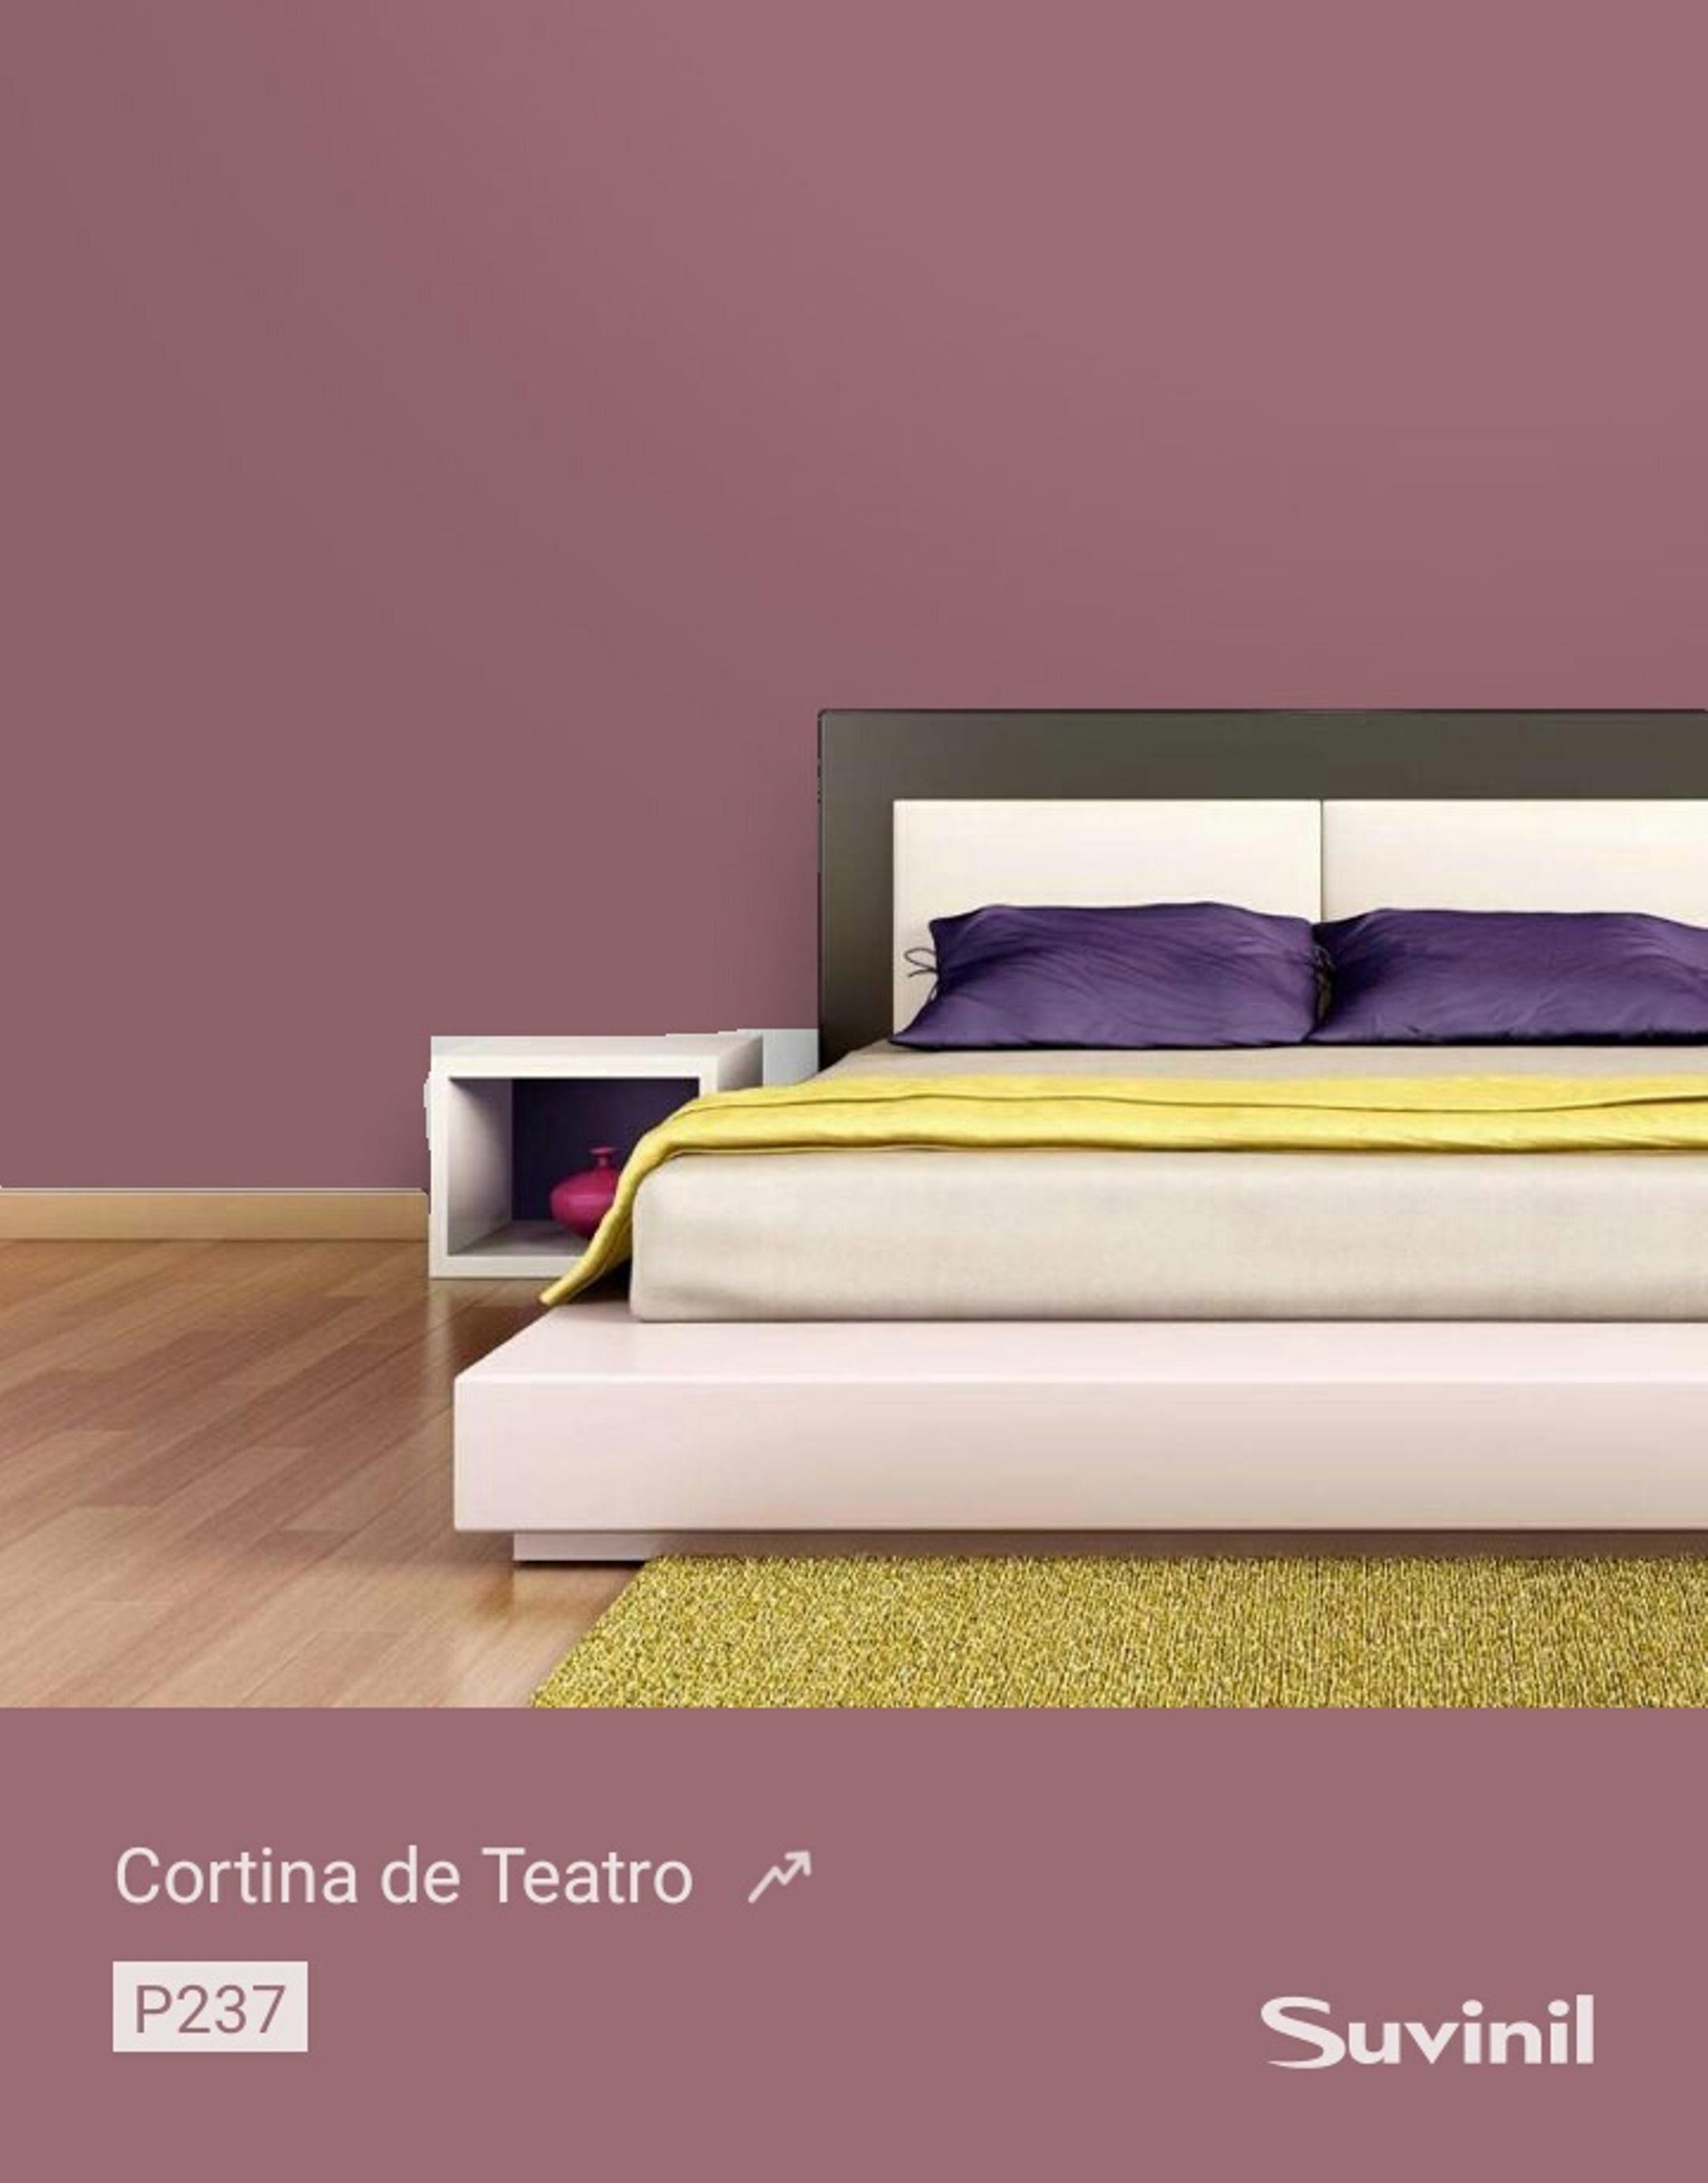 01-novo-app-suvinil-simular-cores-ambientes-reais